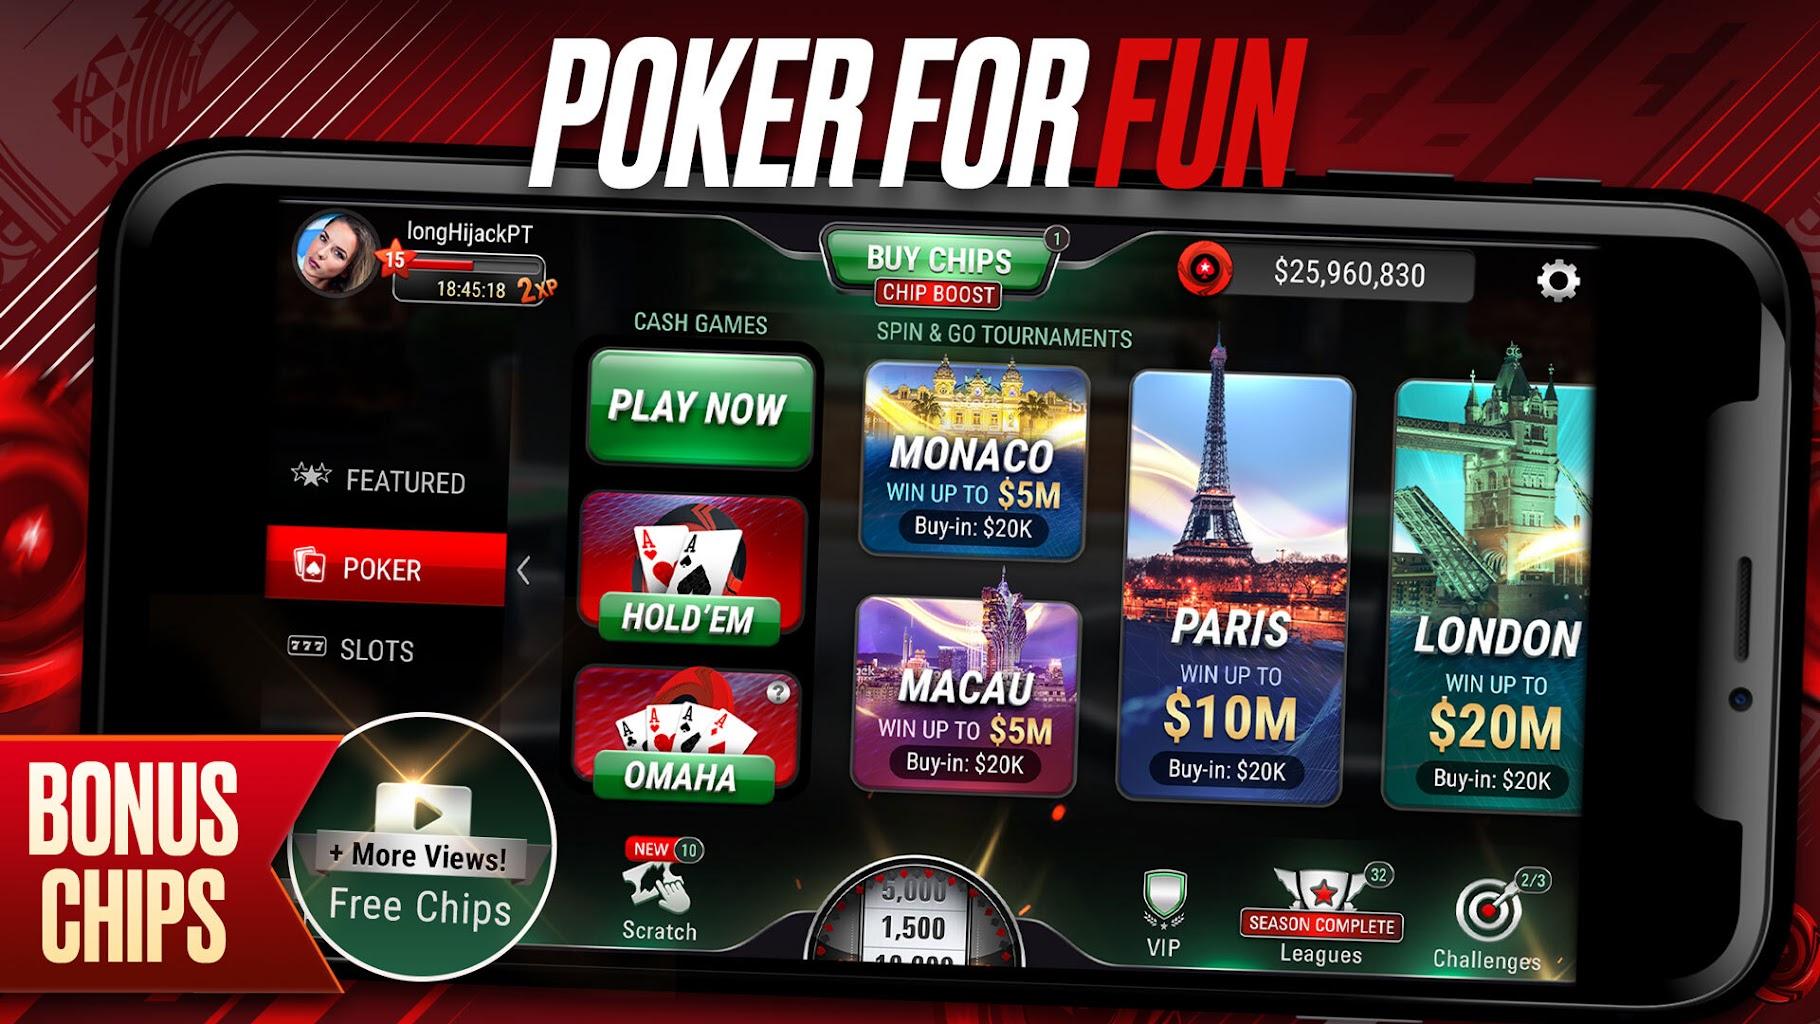 Jackpot Poker By Pokerstars Free Poker Online 6 2 6 Apk Download Com Pokerstars Cebo Apk Free